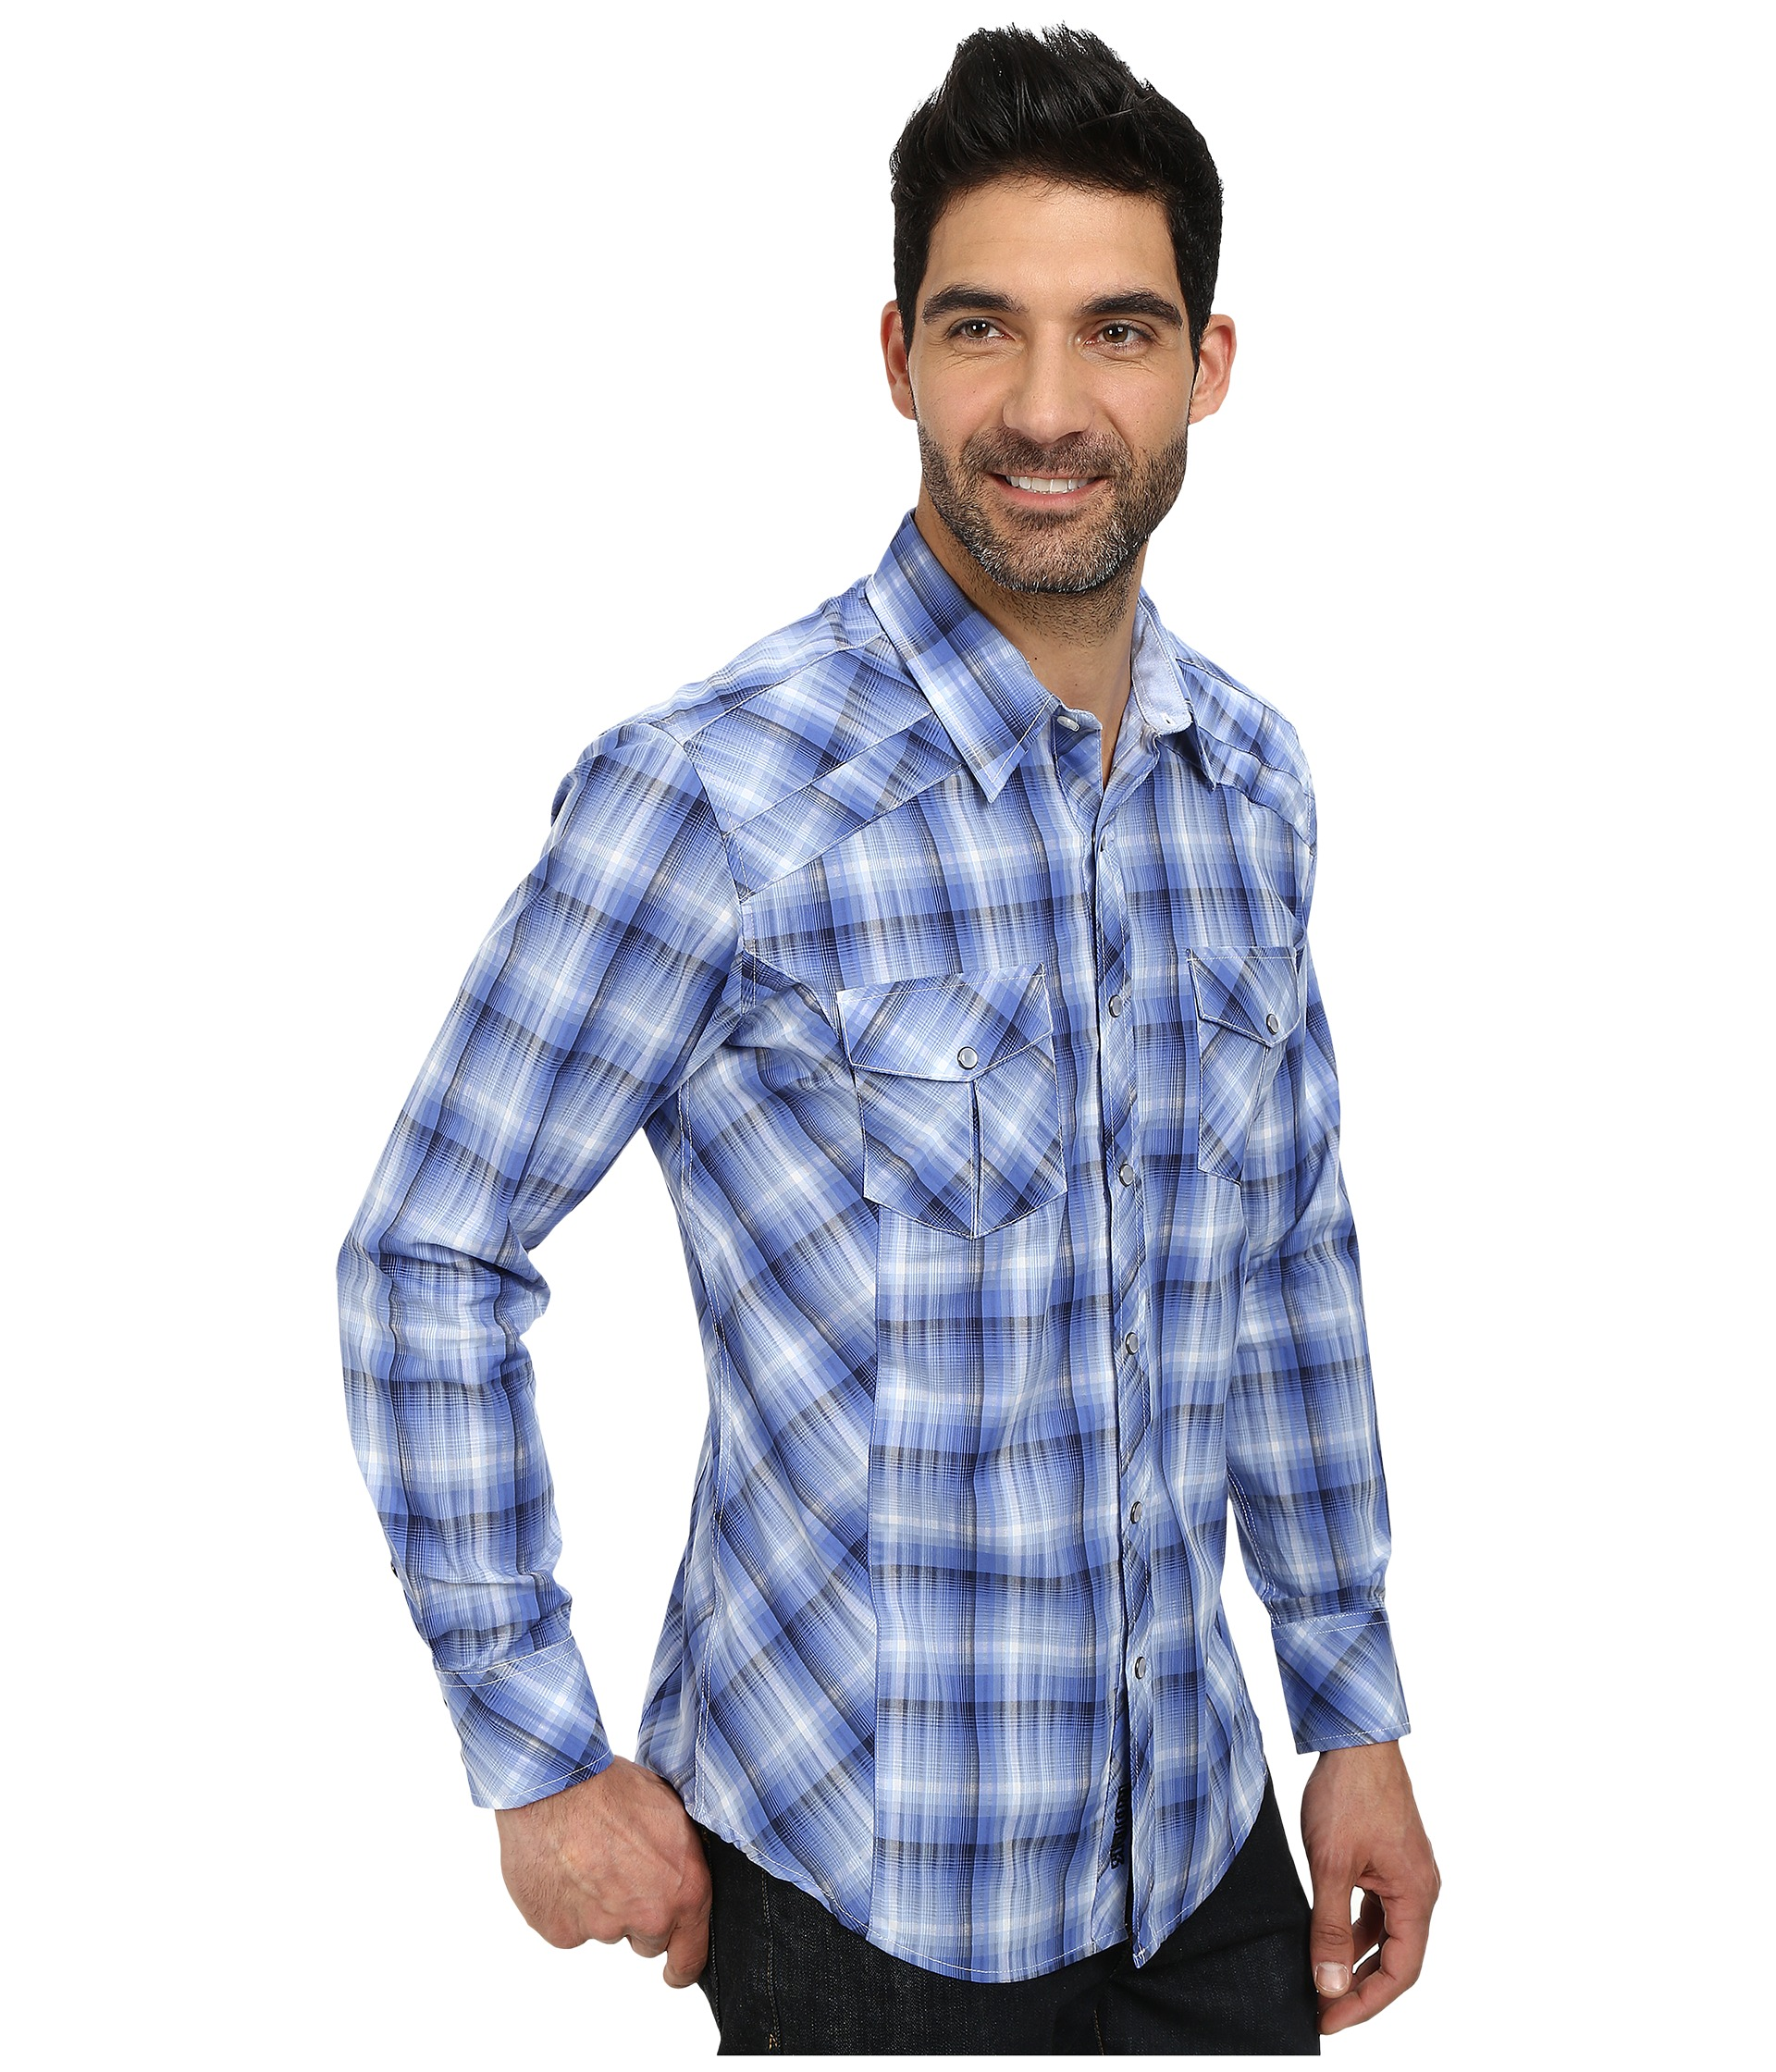 Untucked Shirts Deals On 1001 Blocks